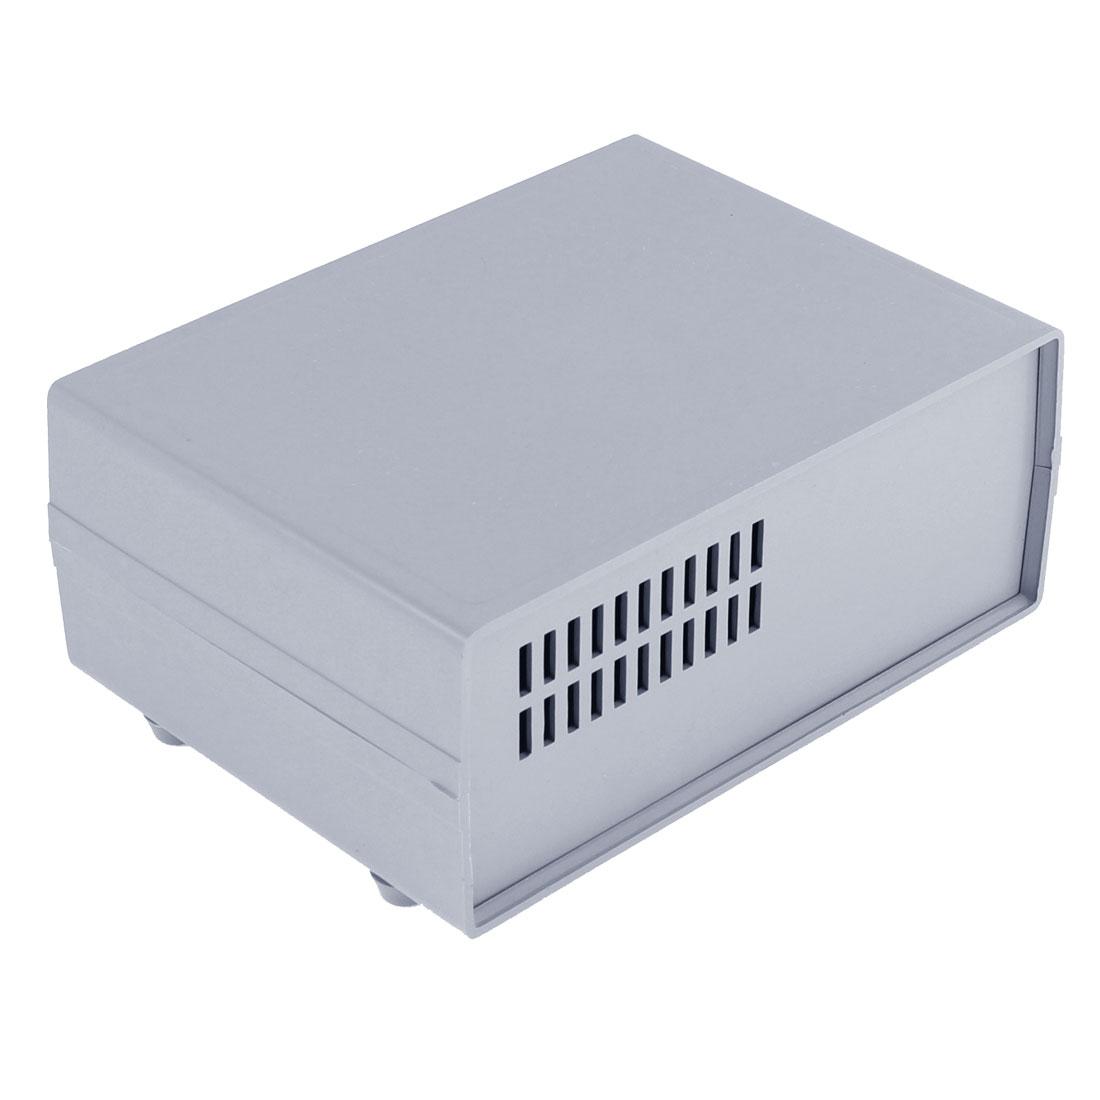 DIY Project Power Enclosure Electrical Junction Box 16.5 x 12 x 6.8cm